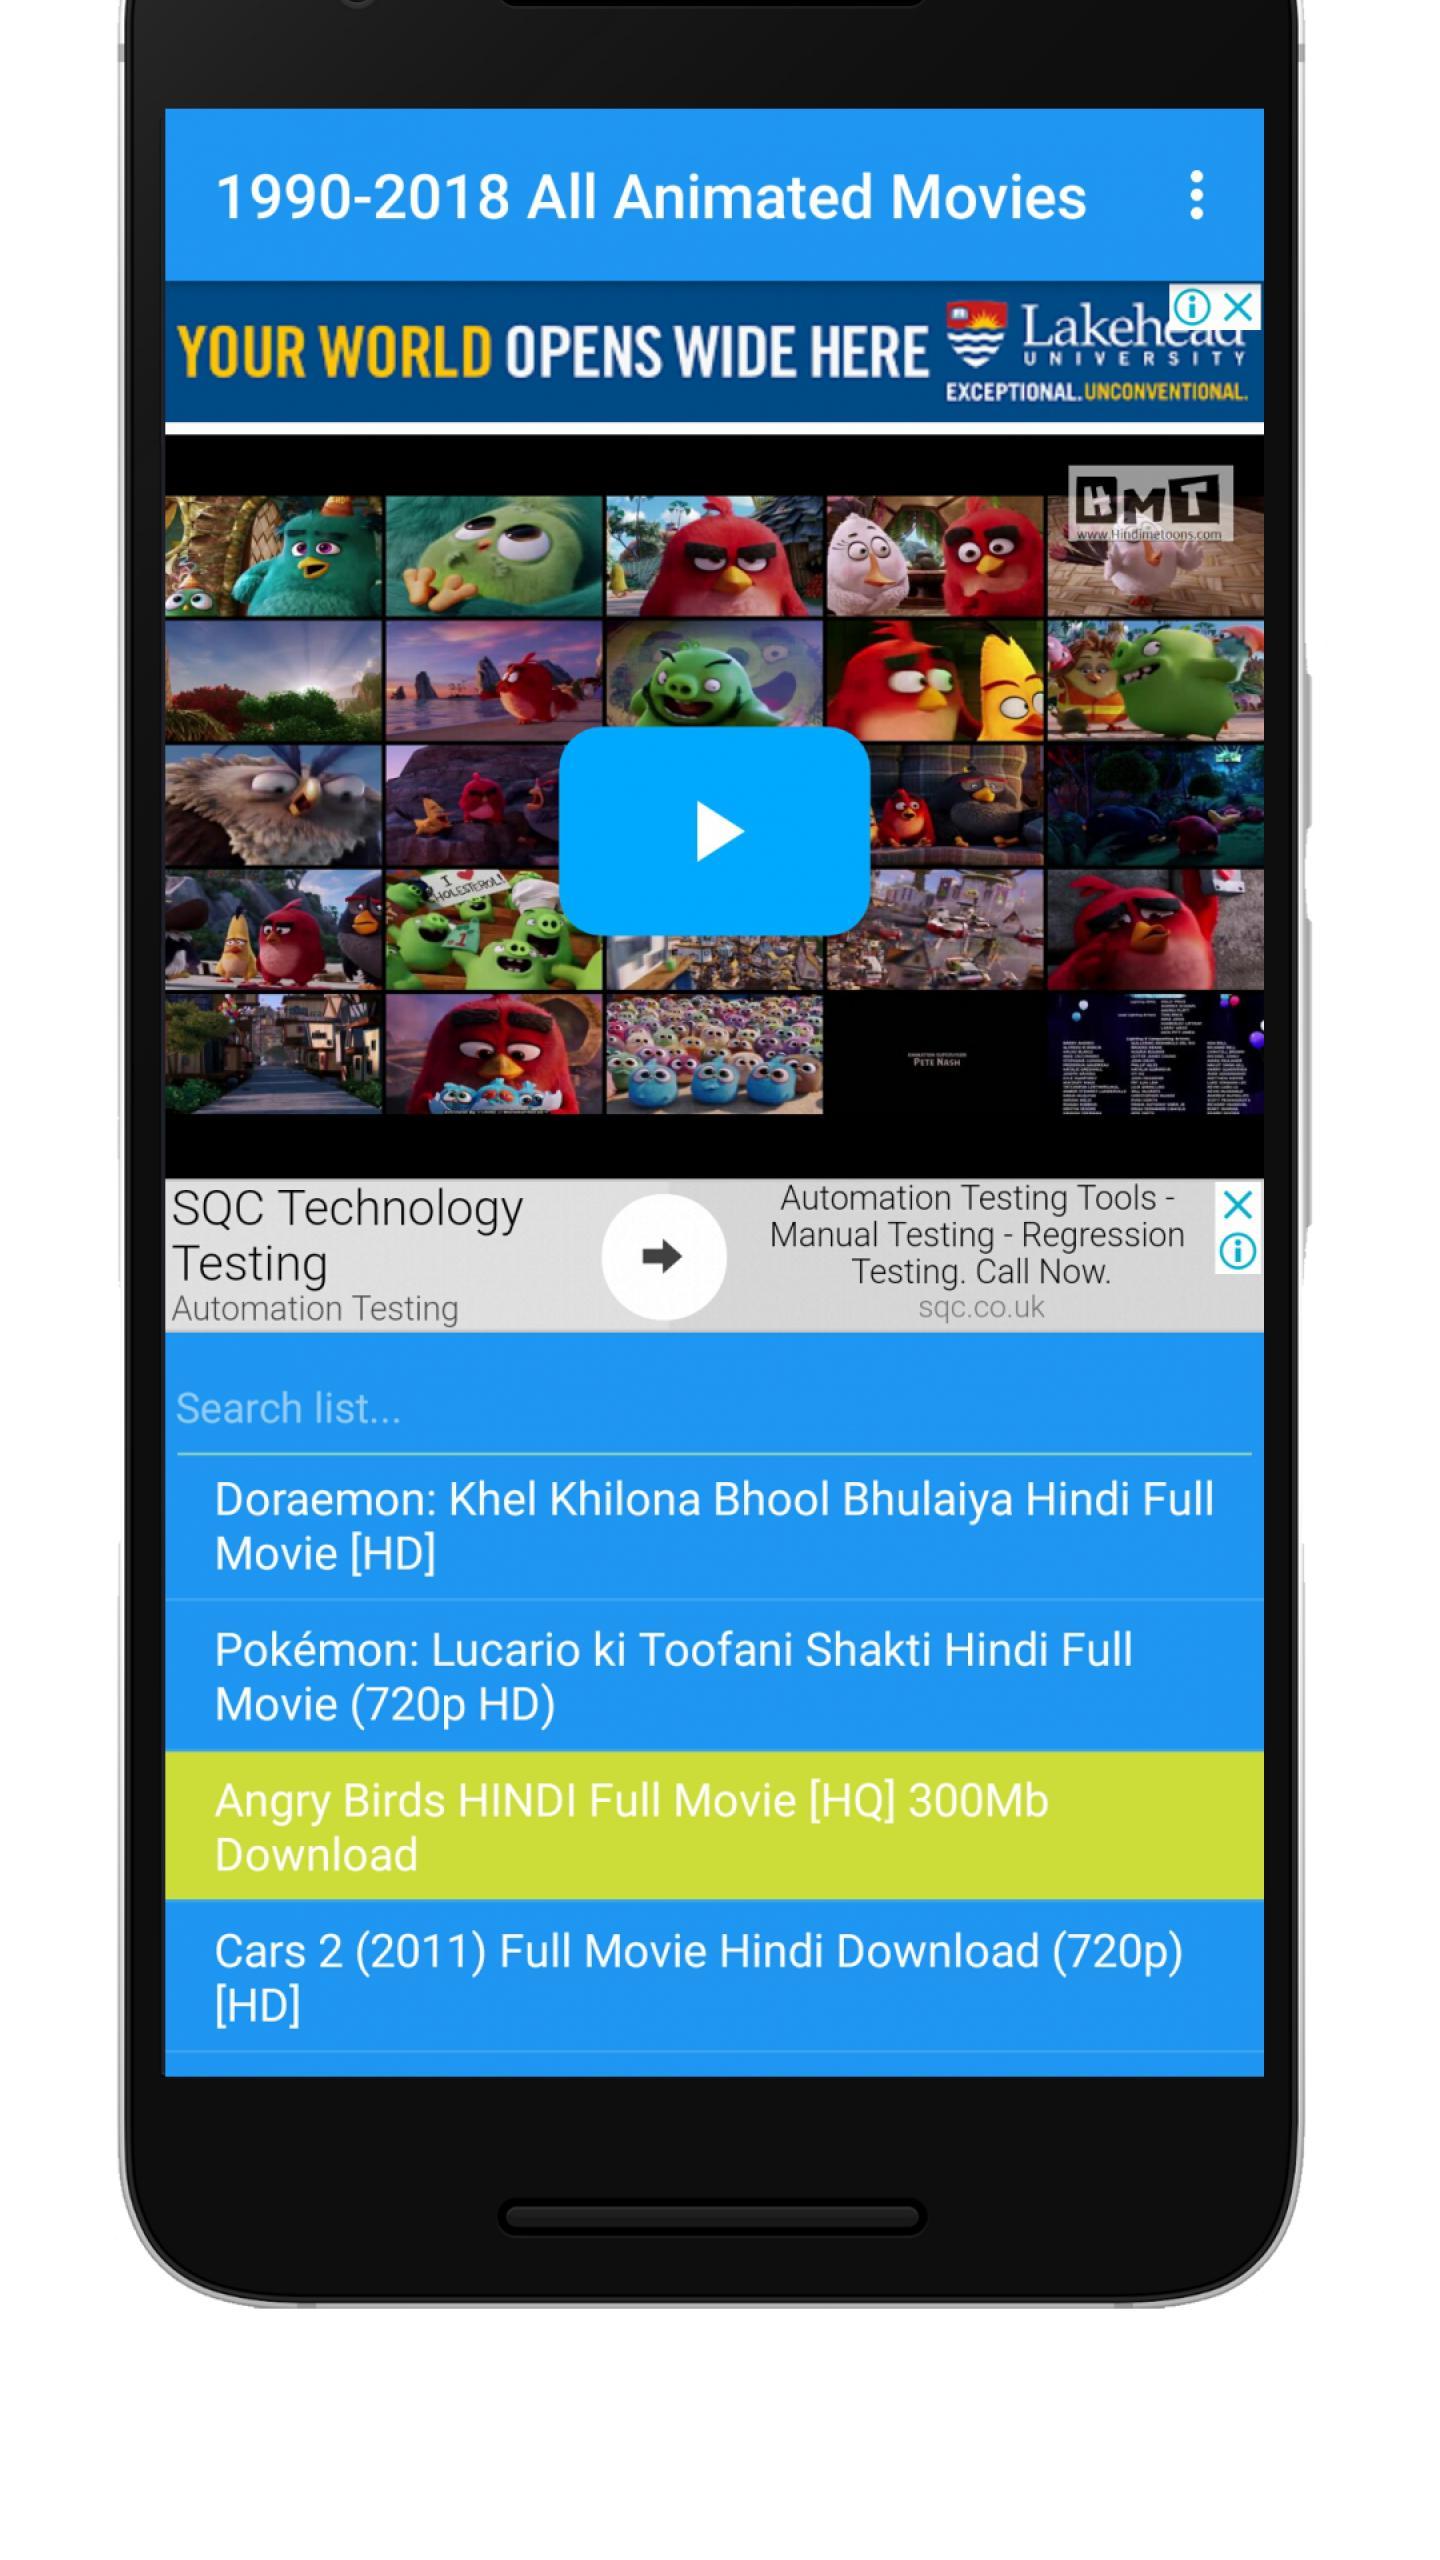 Hindi Cartoon Movies 1990 2018 For Android Apk Download